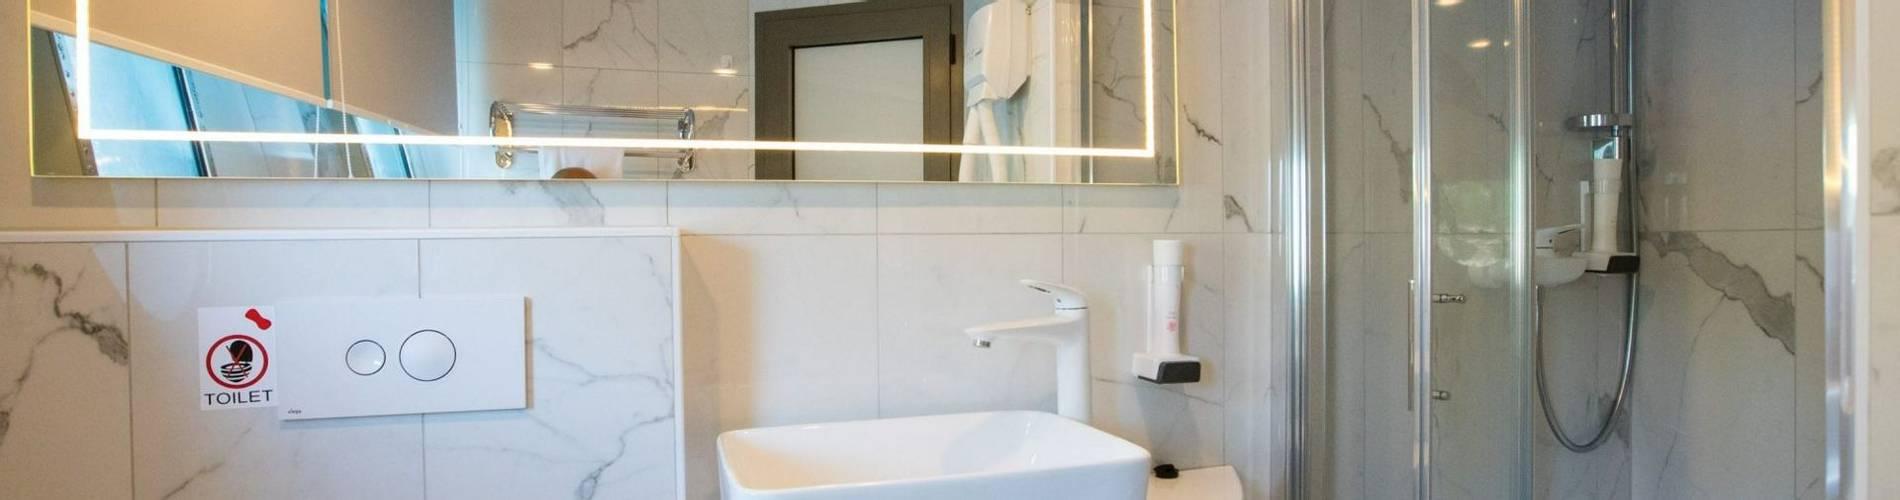 Agape-Rose-Bathroom-1-2000x1335.jpg